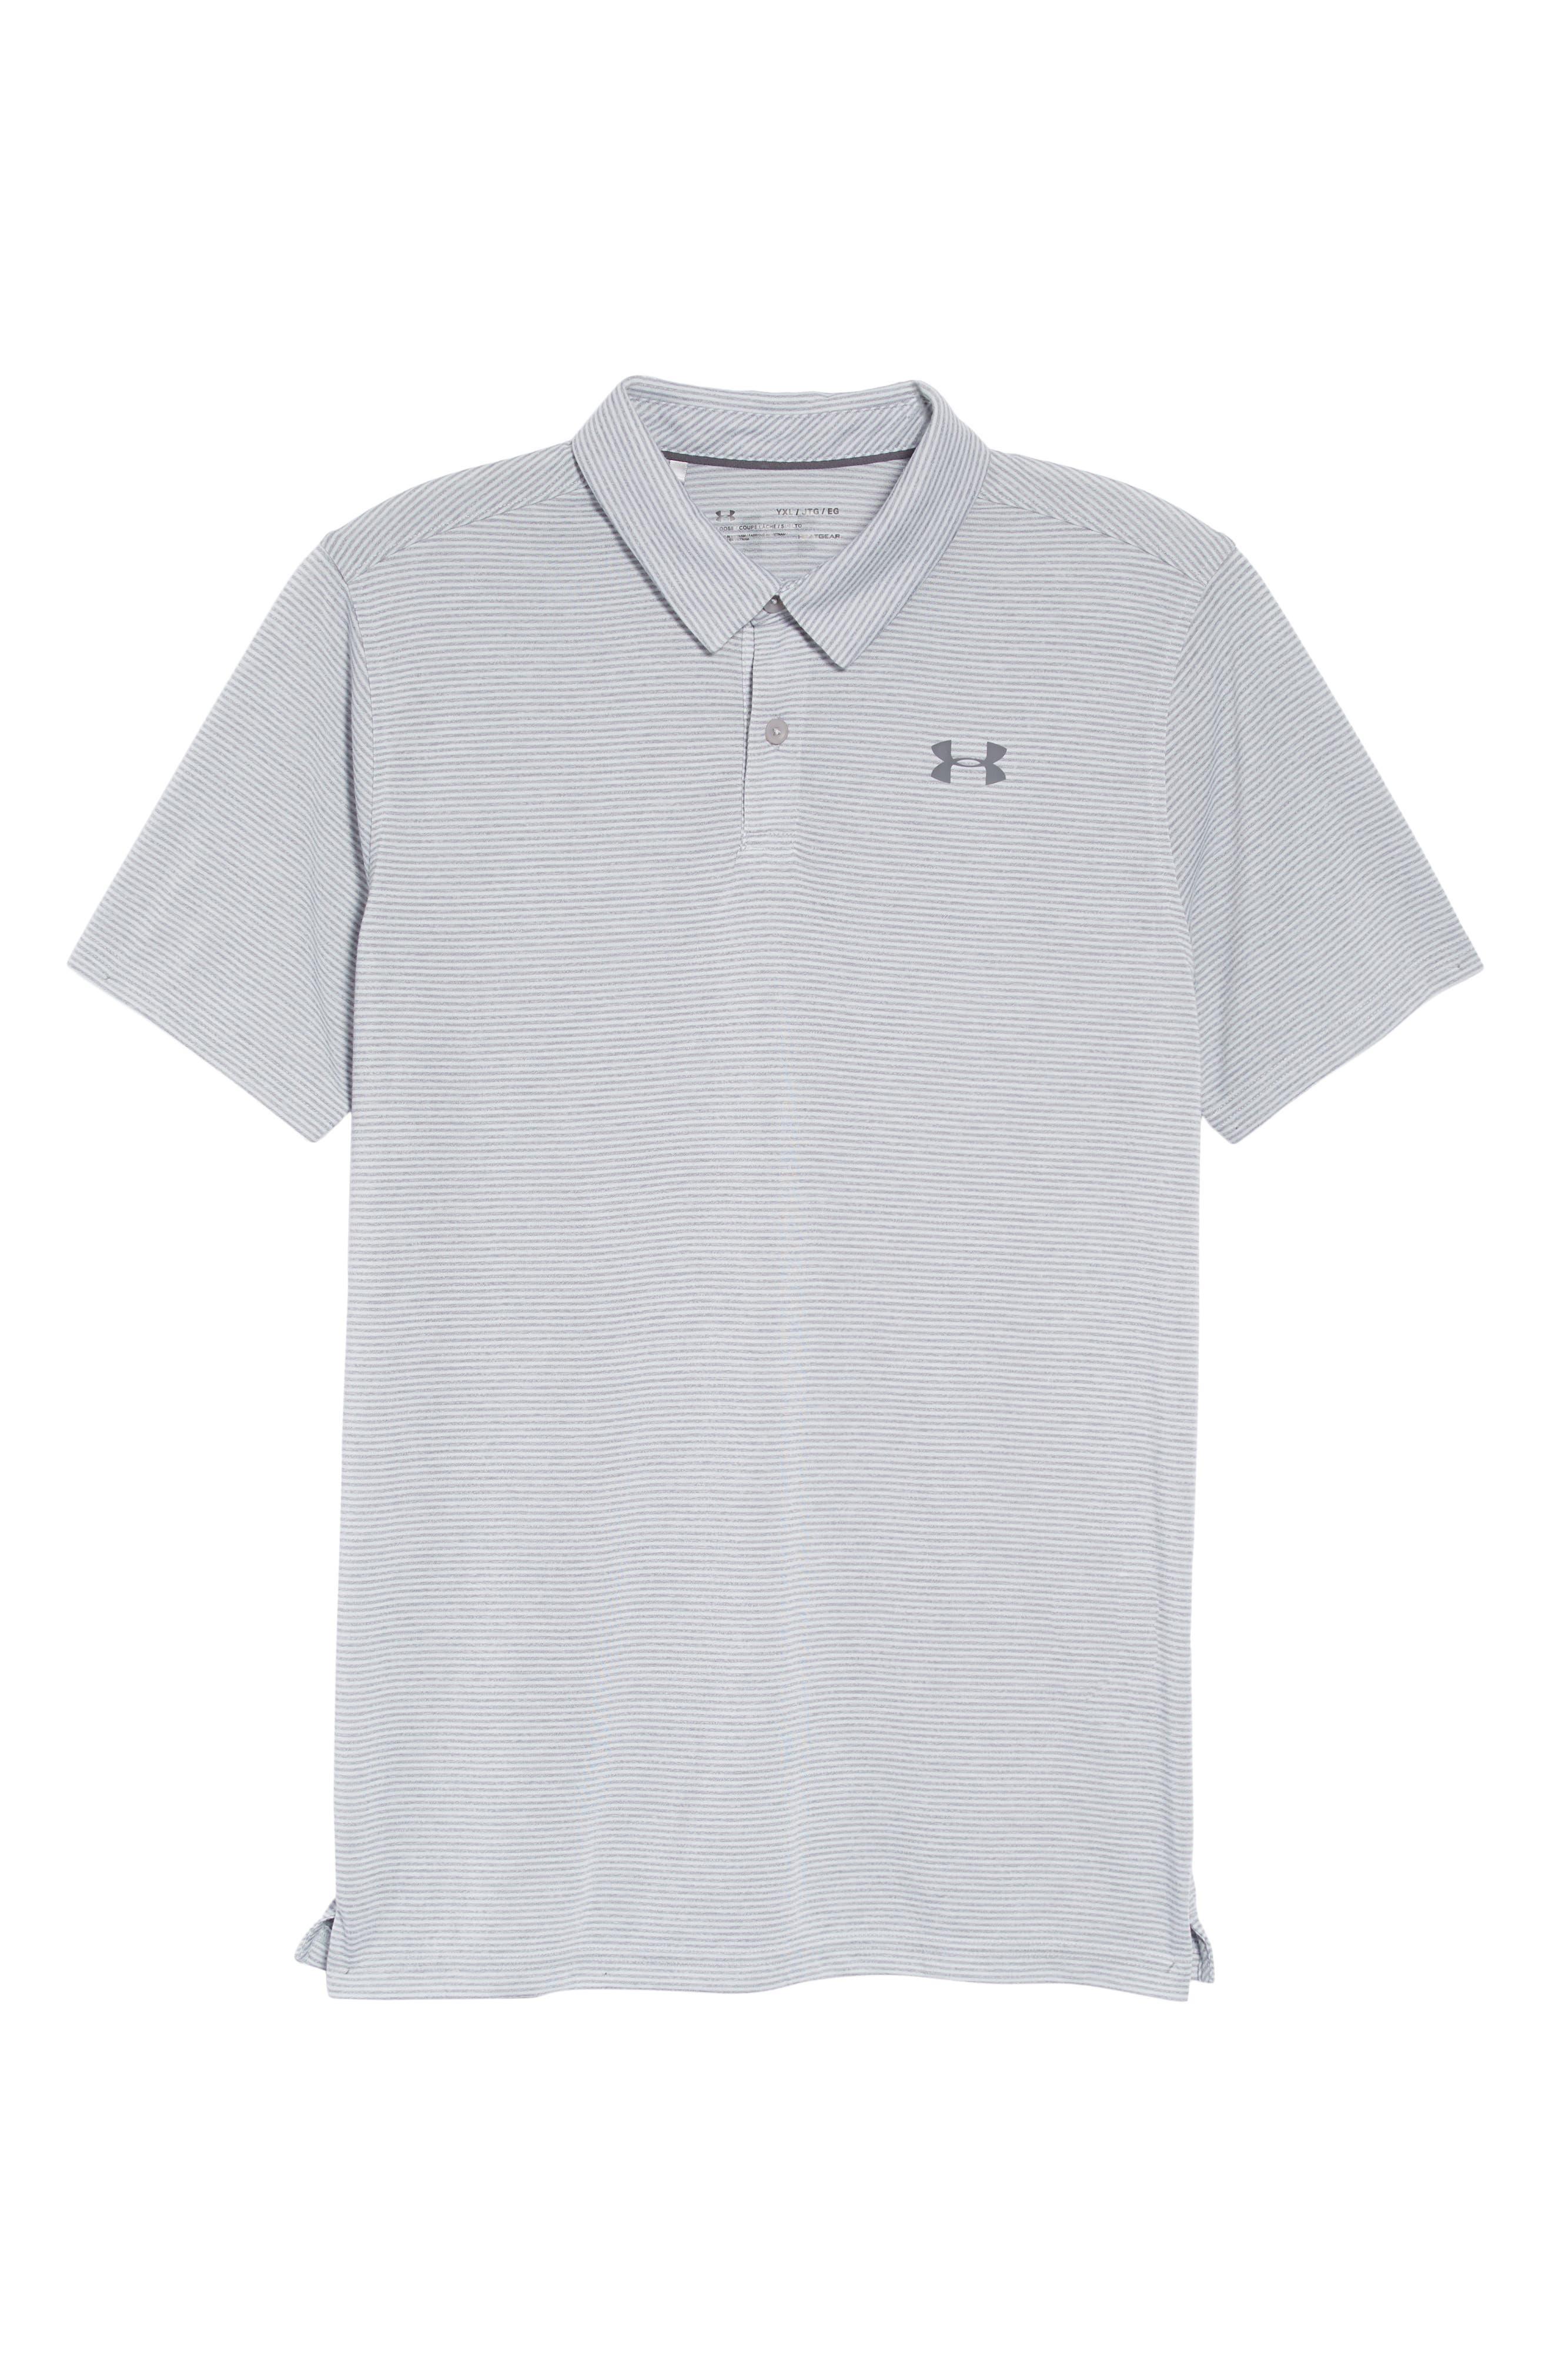 Threadborne Polo,                         Main,                         color, OVERCAST GRAY/ RHINO GRAY